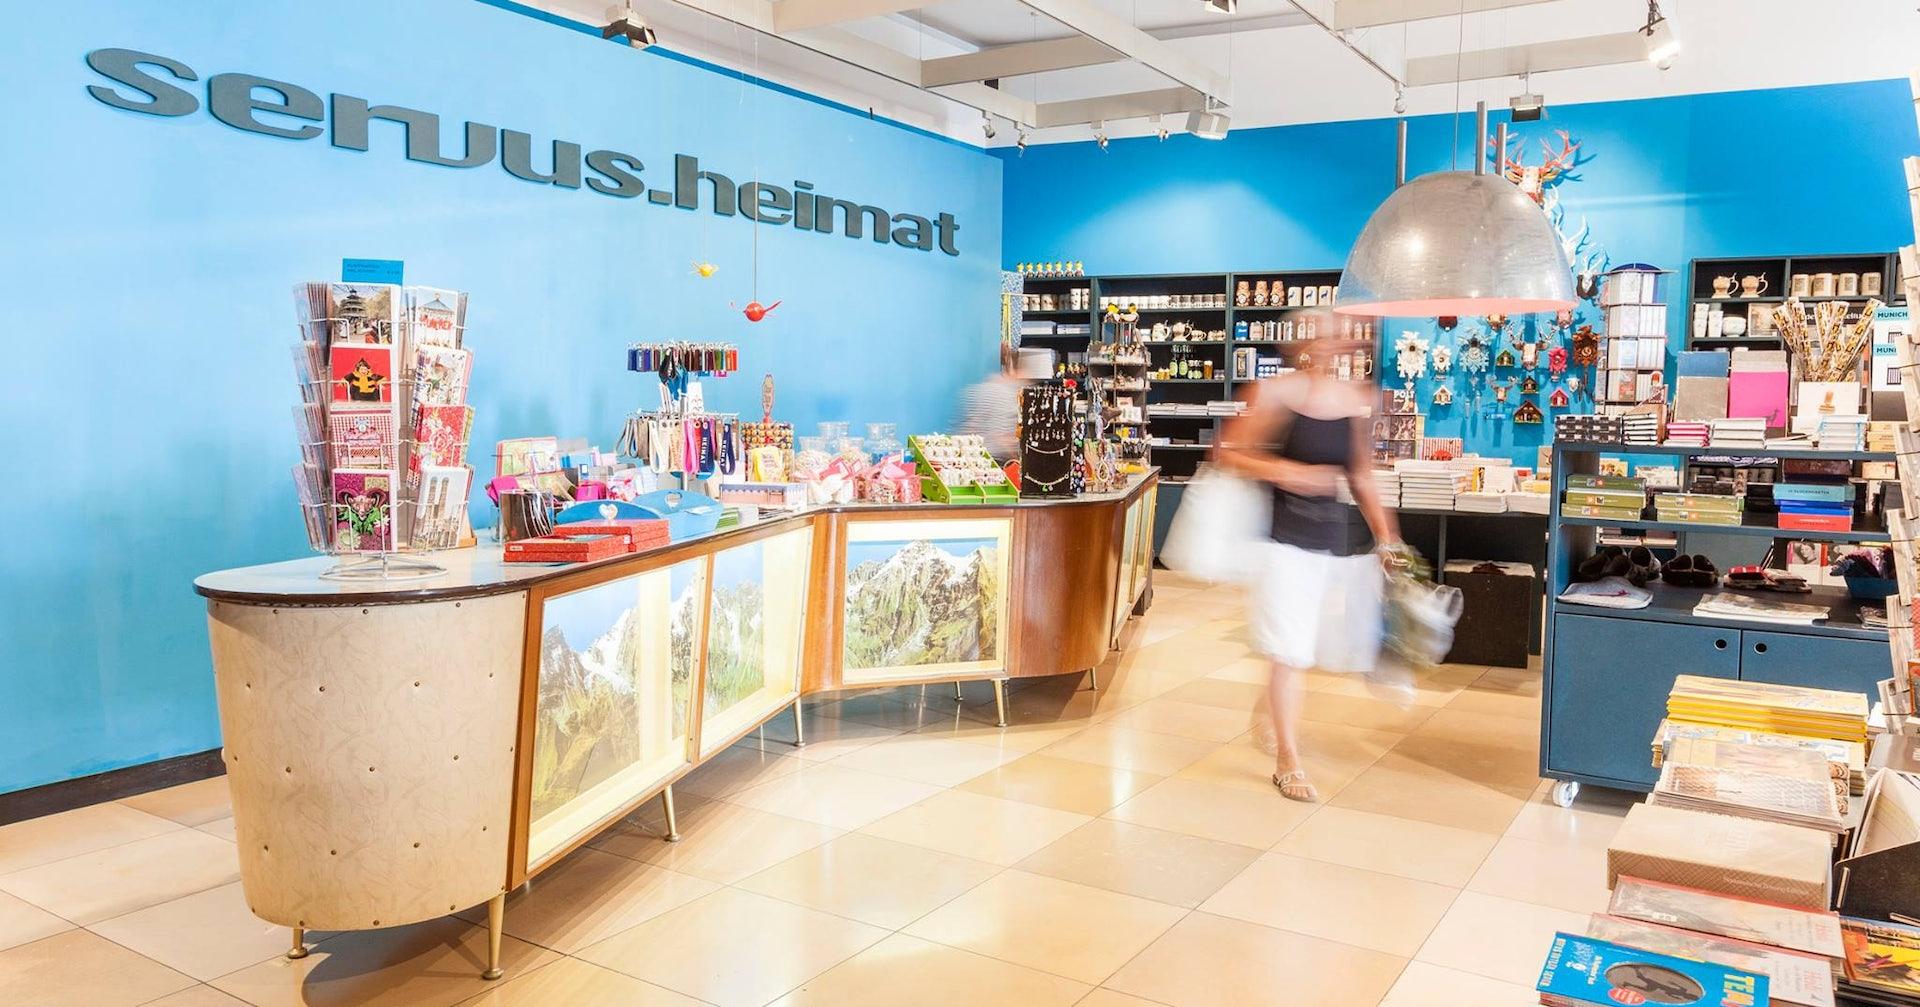 gift shop Servus.Heimat